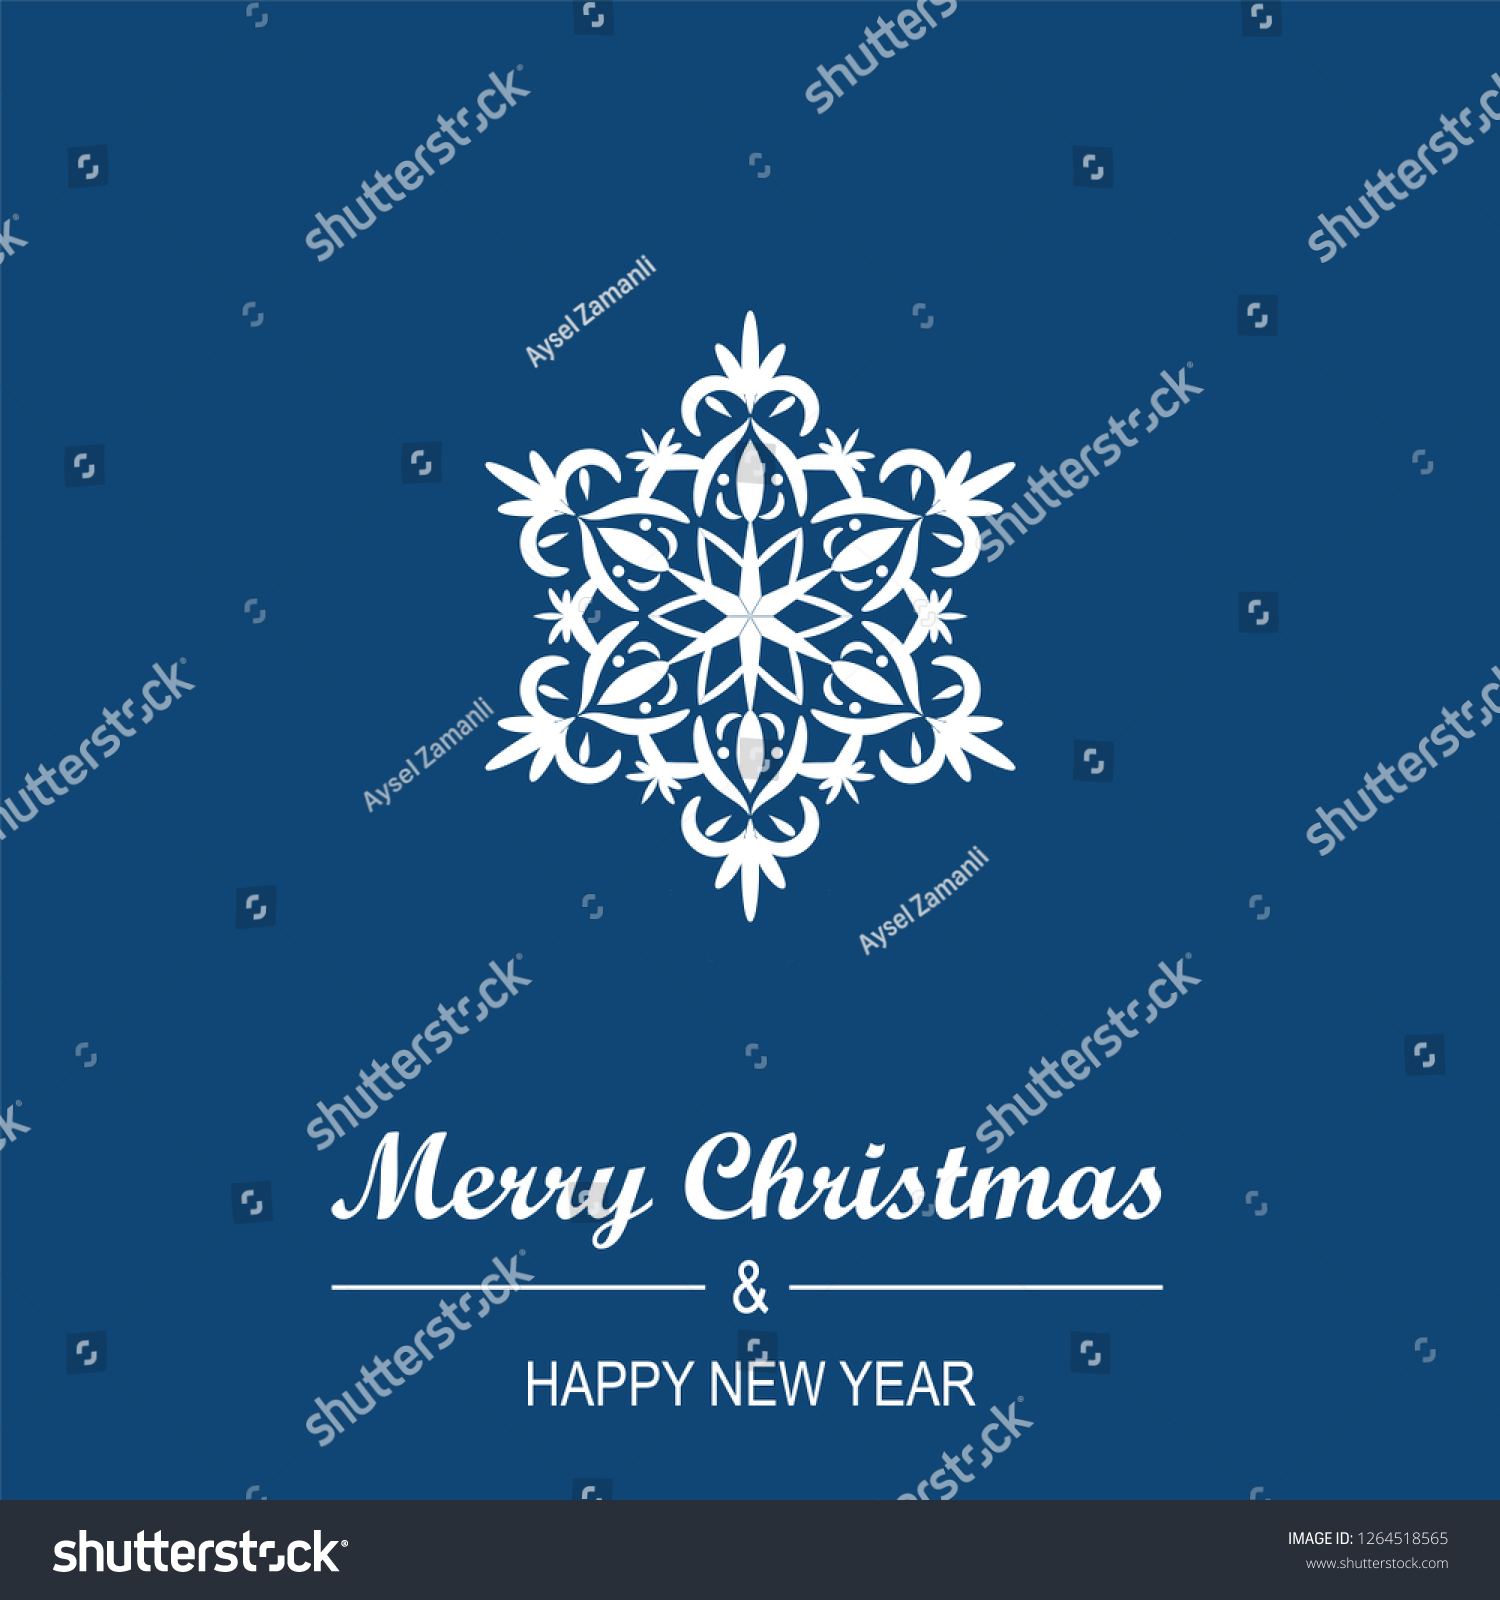 Happy New Year Elegant Images 28